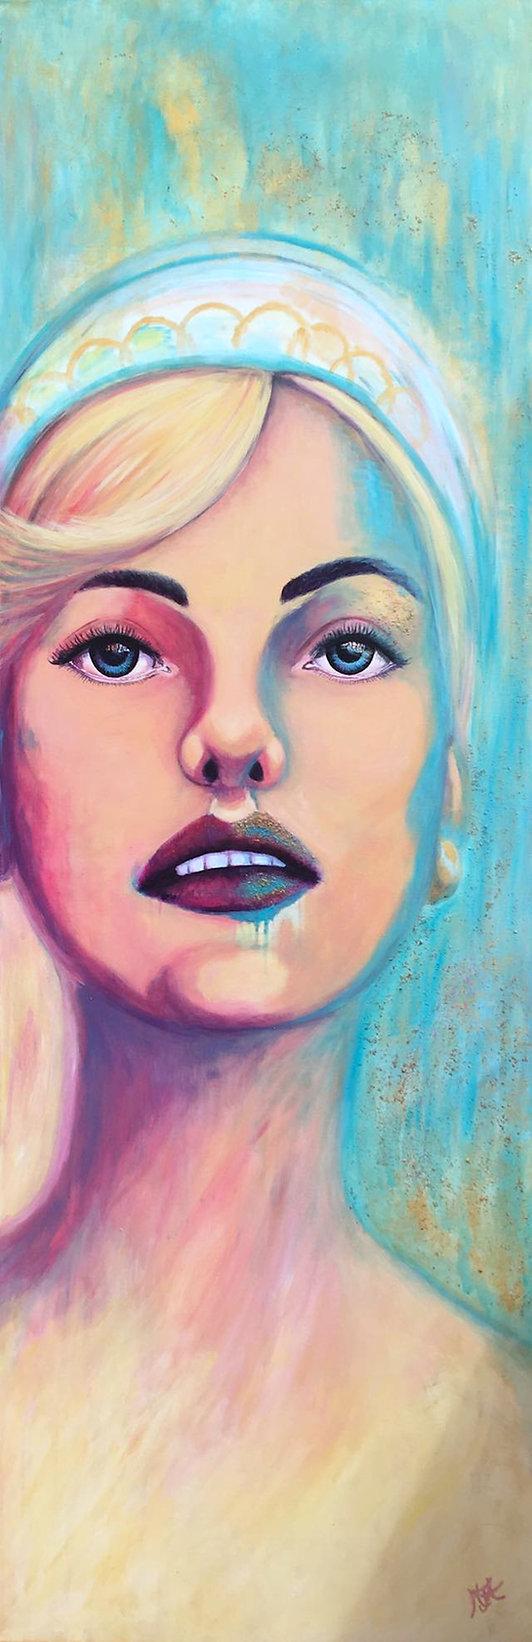 Portrait Paintings by artist Art by Mandy UK